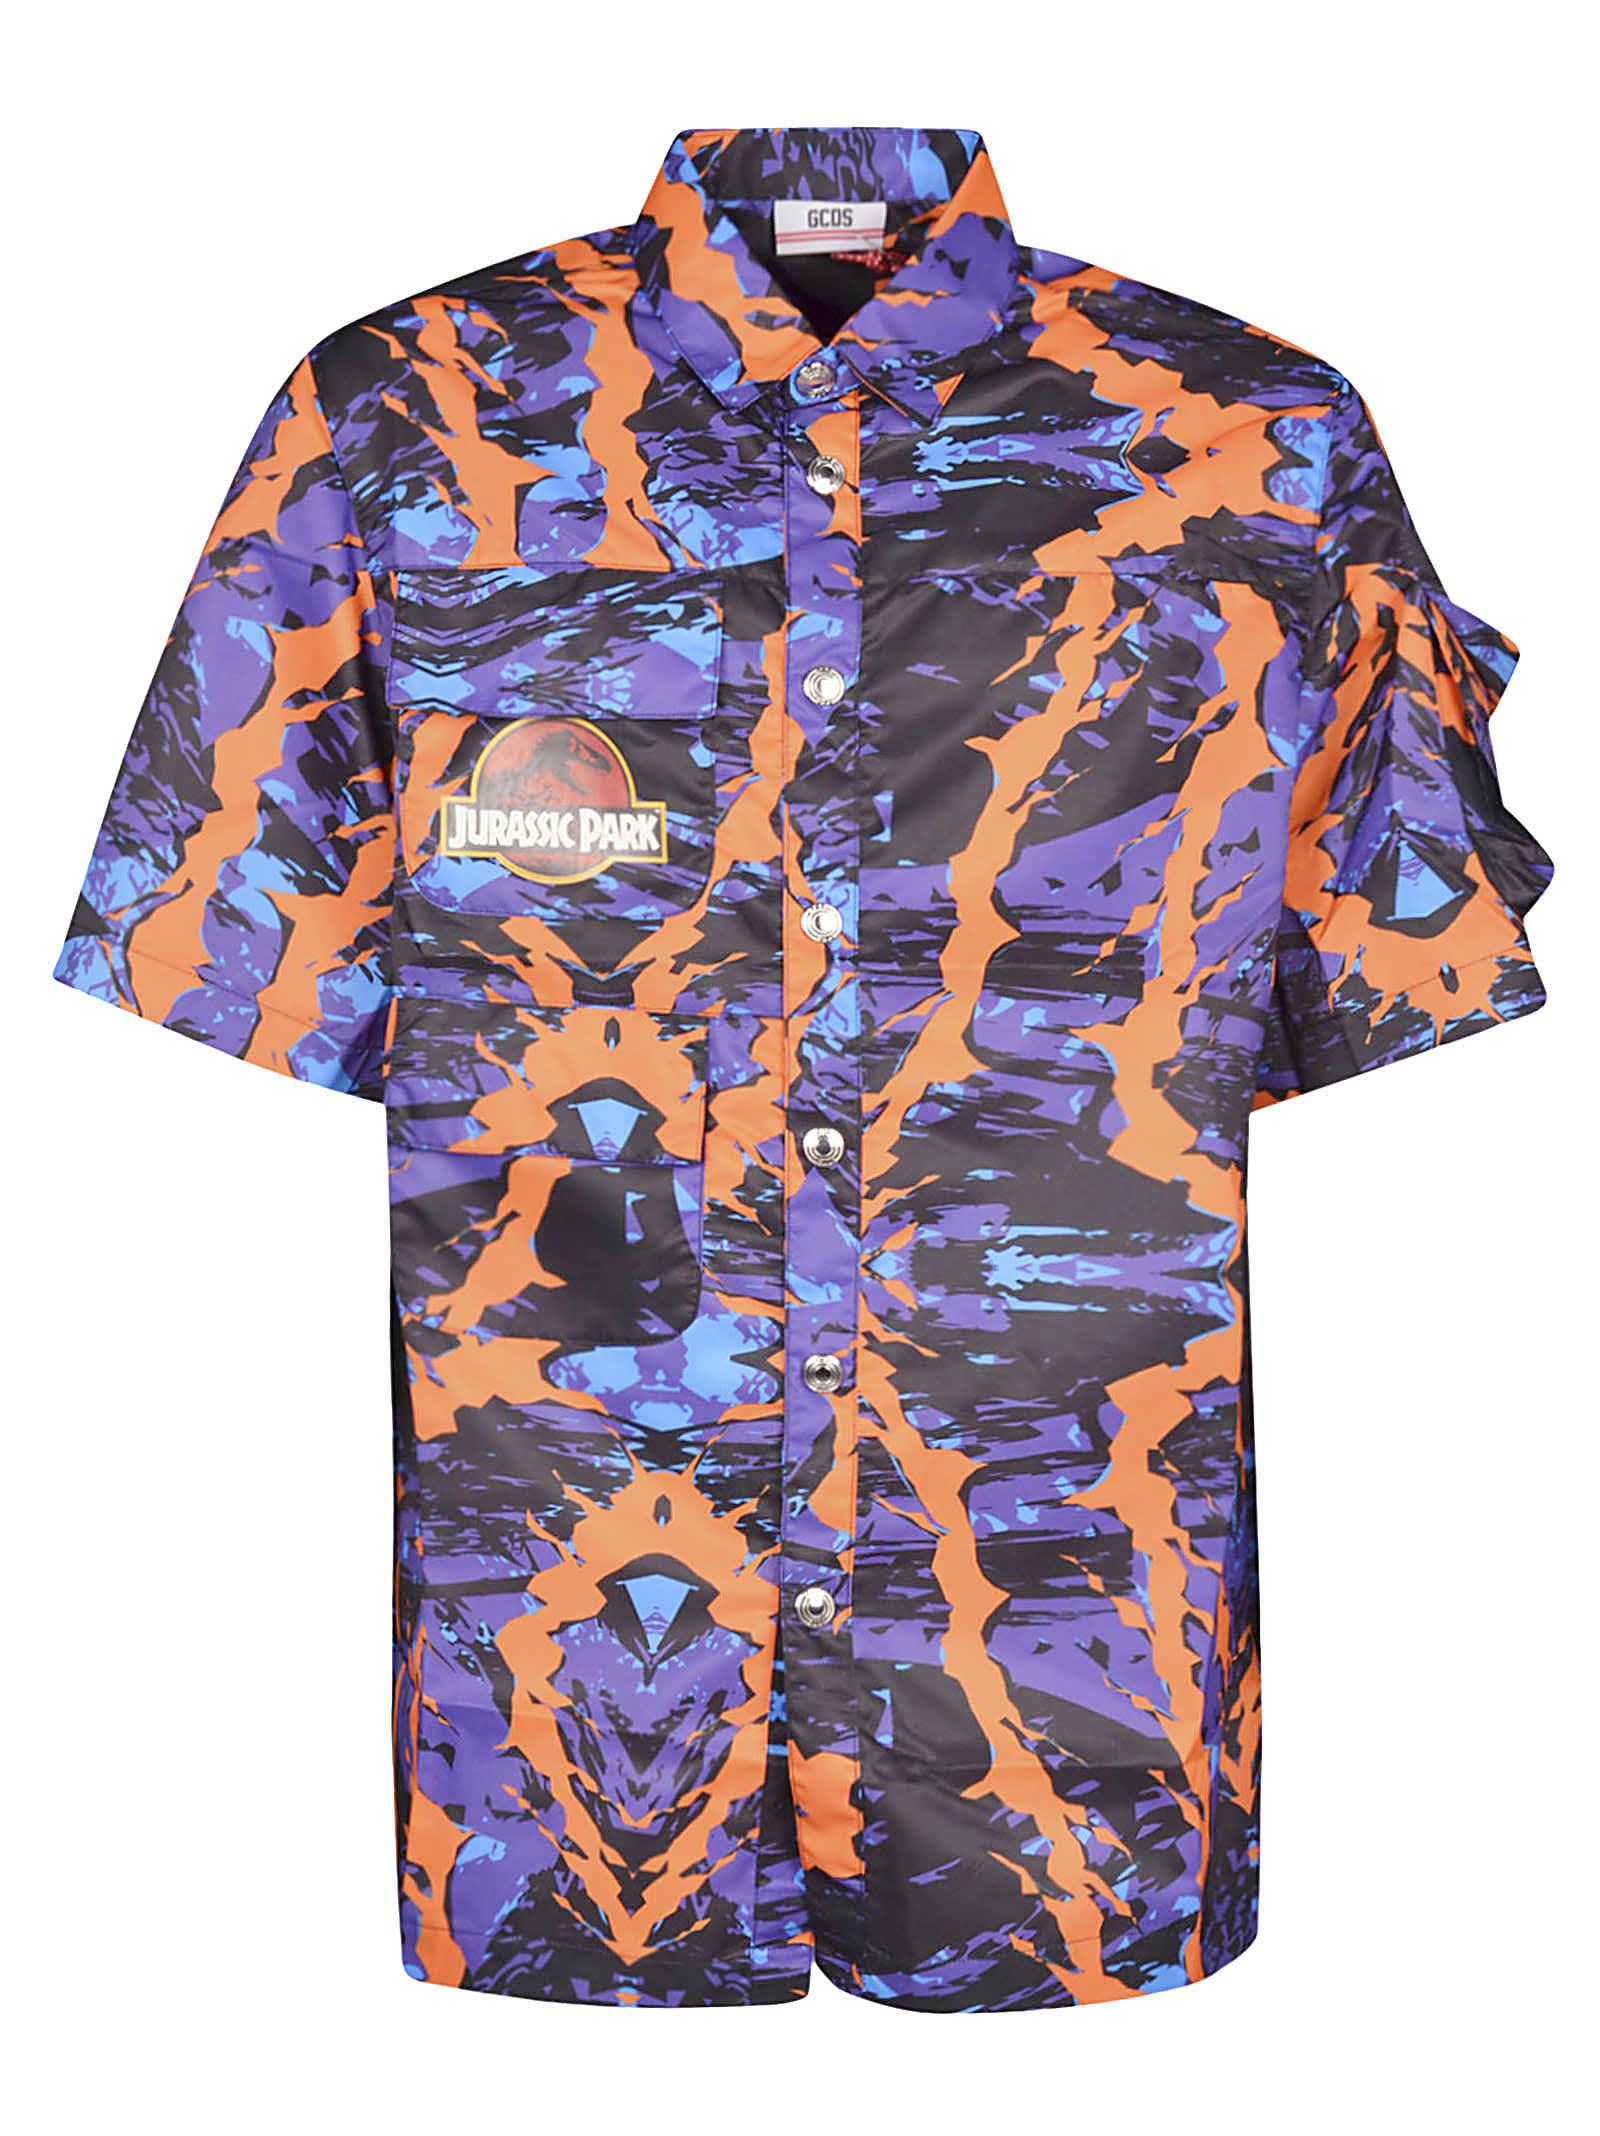 GCDS Jurassic Park Printed Shirt